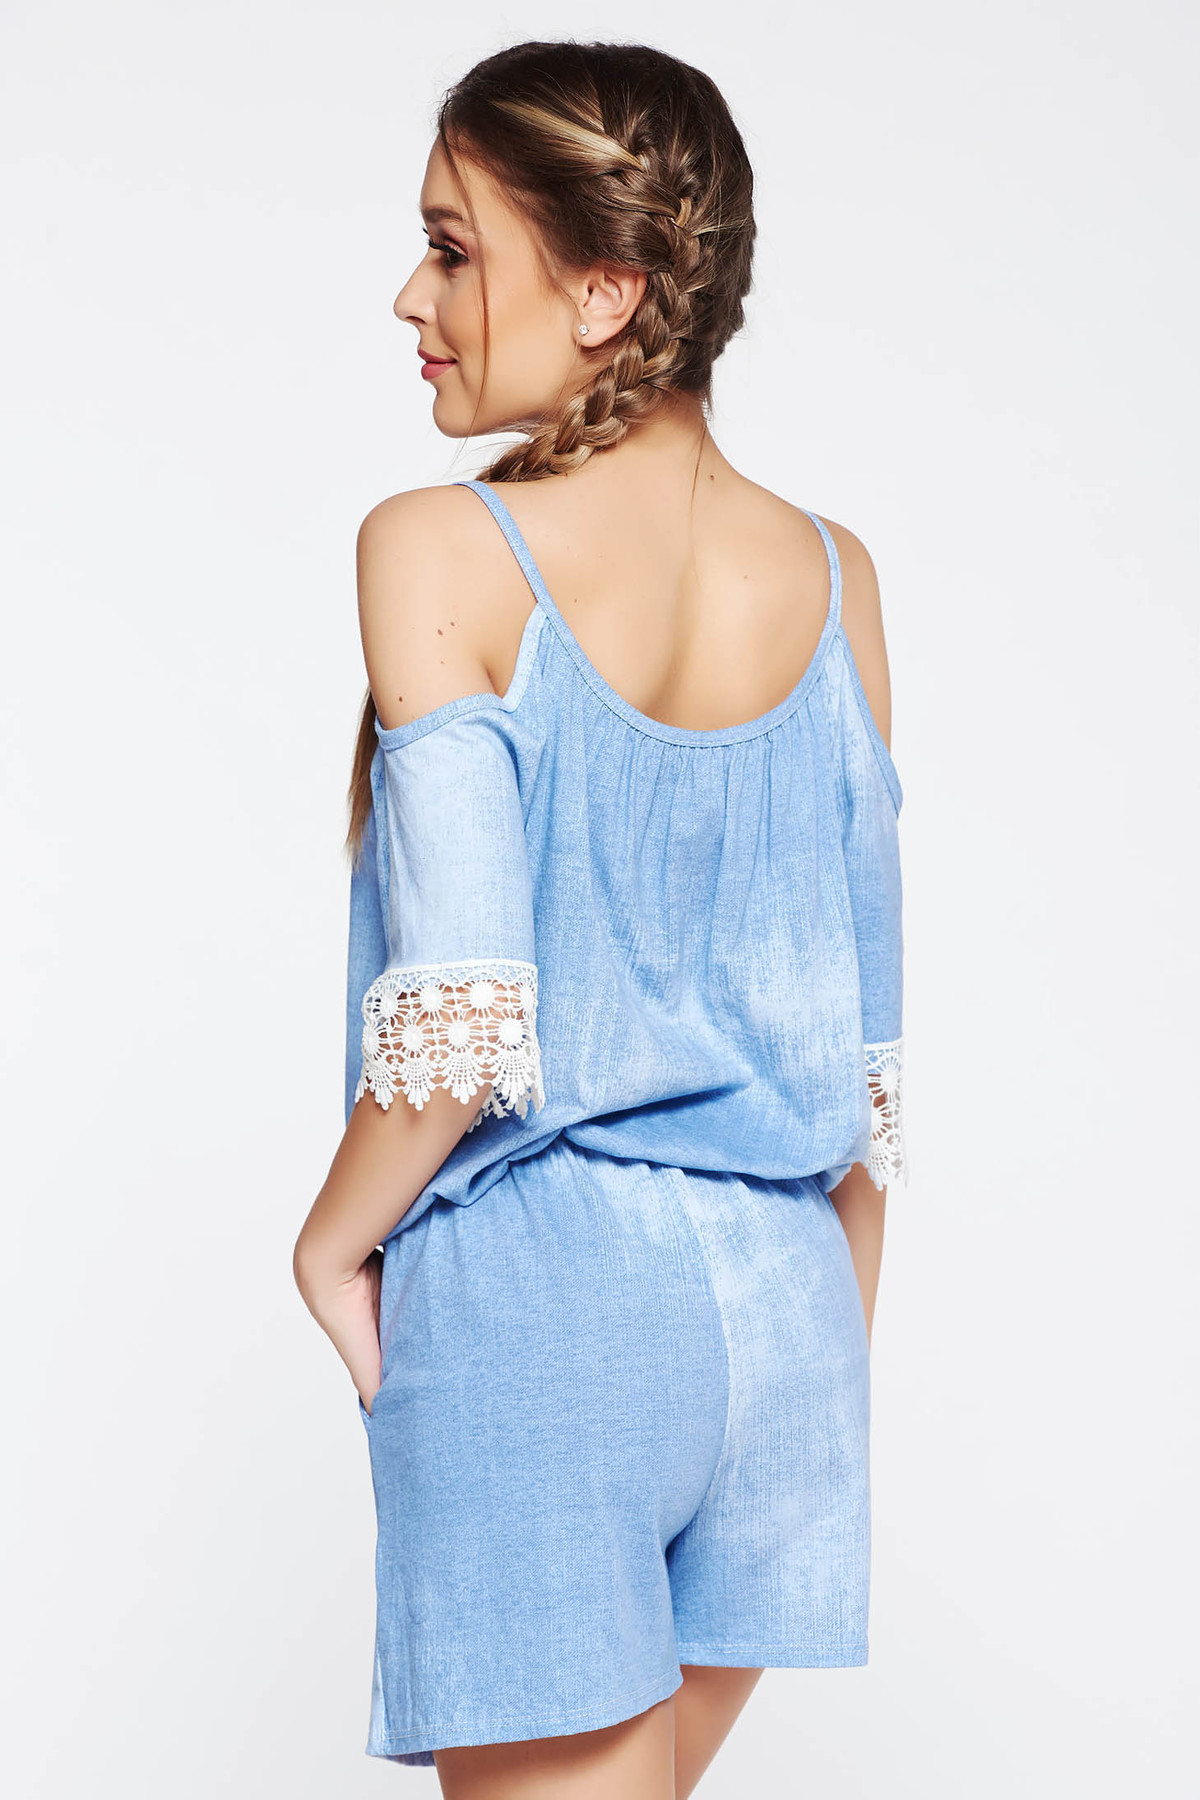 Salopeta SunShine albastra casual cu croi larg cu elastic in talie cu umeri decupati si aplicatii de dantela